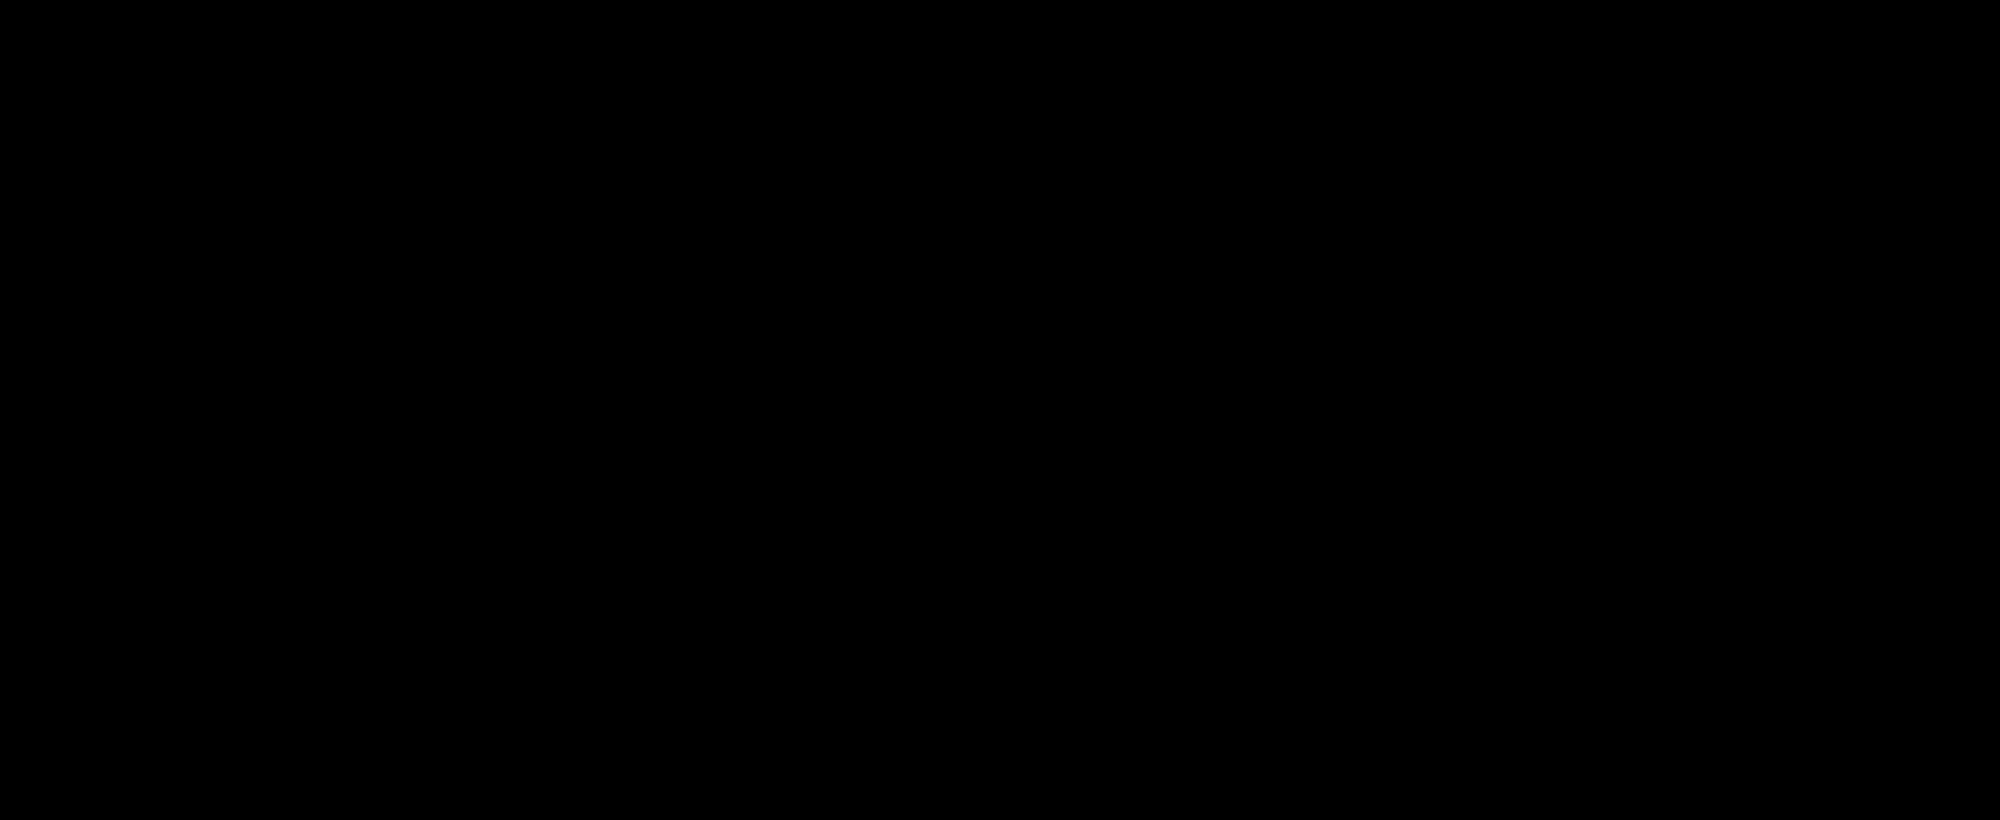 Apple logos or banner clipart vector transparent stock 500+ Apple LOGO - Latest Apple Logo, Icon, GIF, Transparent PNG vector transparent stock